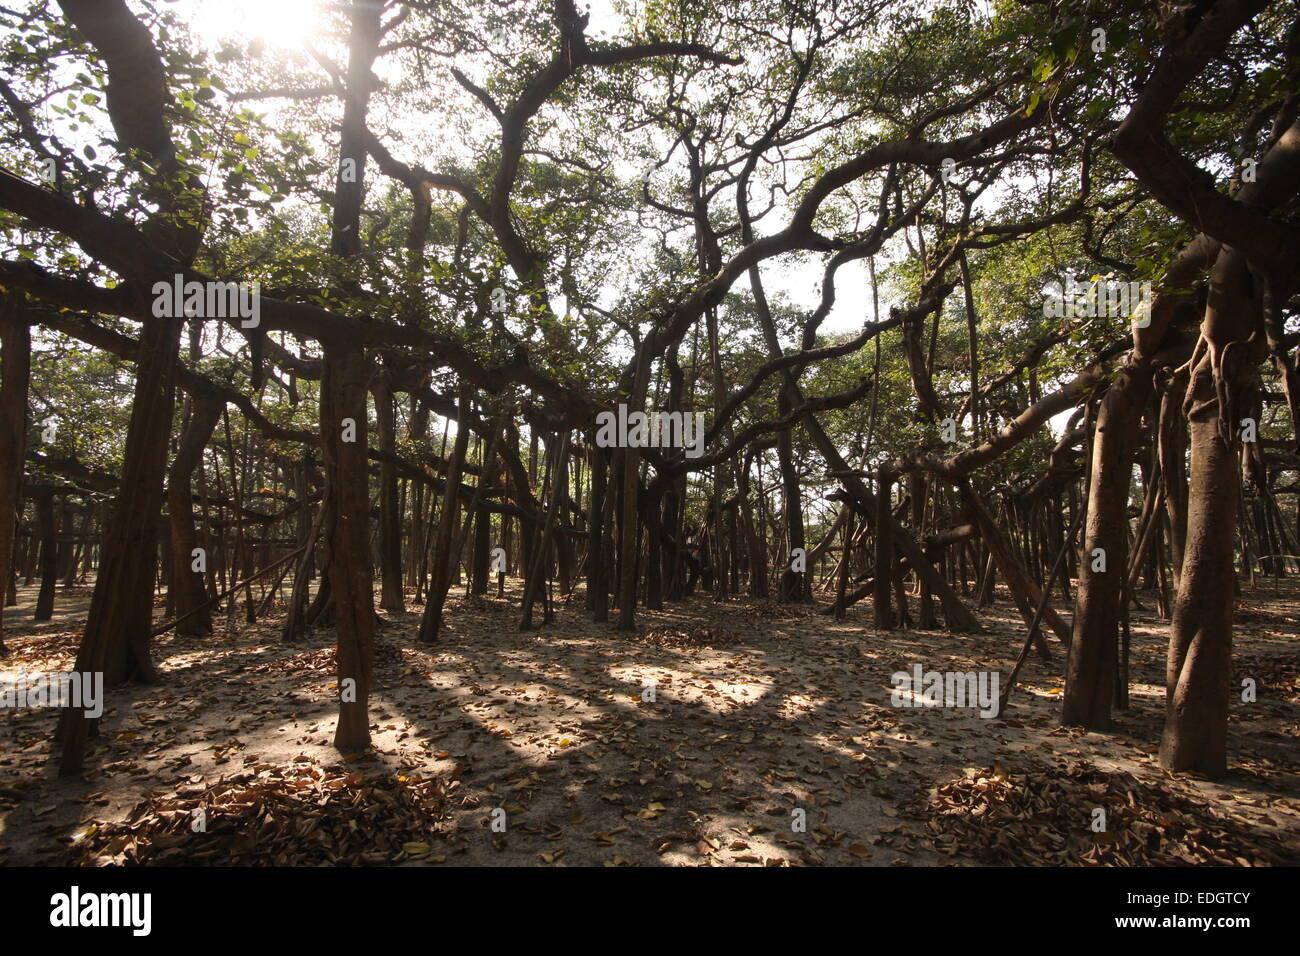 World's largest banyan tree in Calcutta Botanical Garden, India - Stock Image